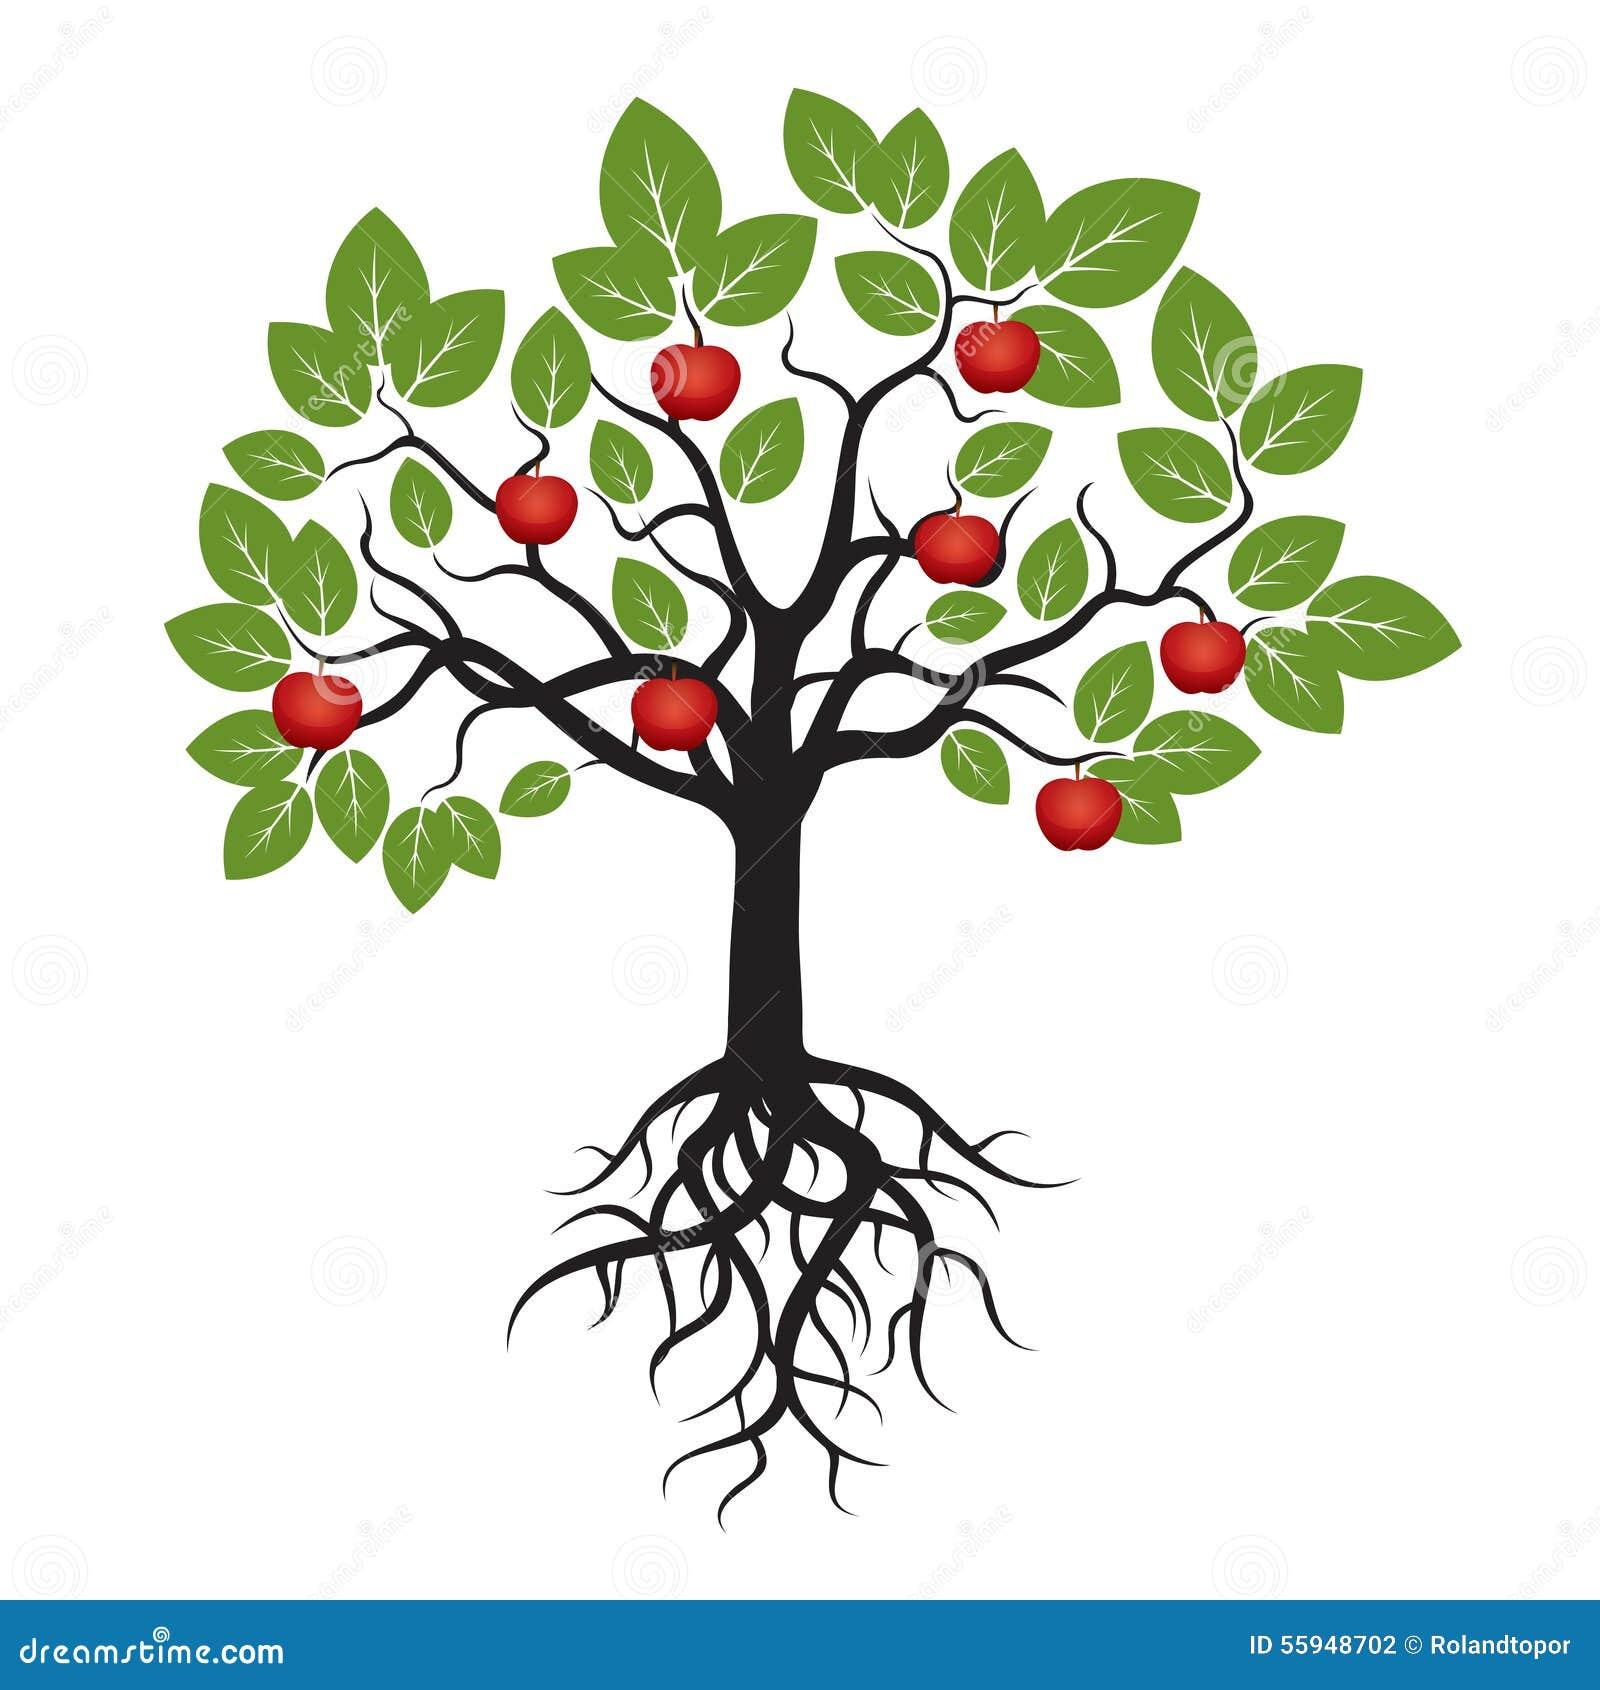 arbre avec les feuilles vertes les racines et l 39 apple rouge illustration stock illustration. Black Bedroom Furniture Sets. Home Design Ideas